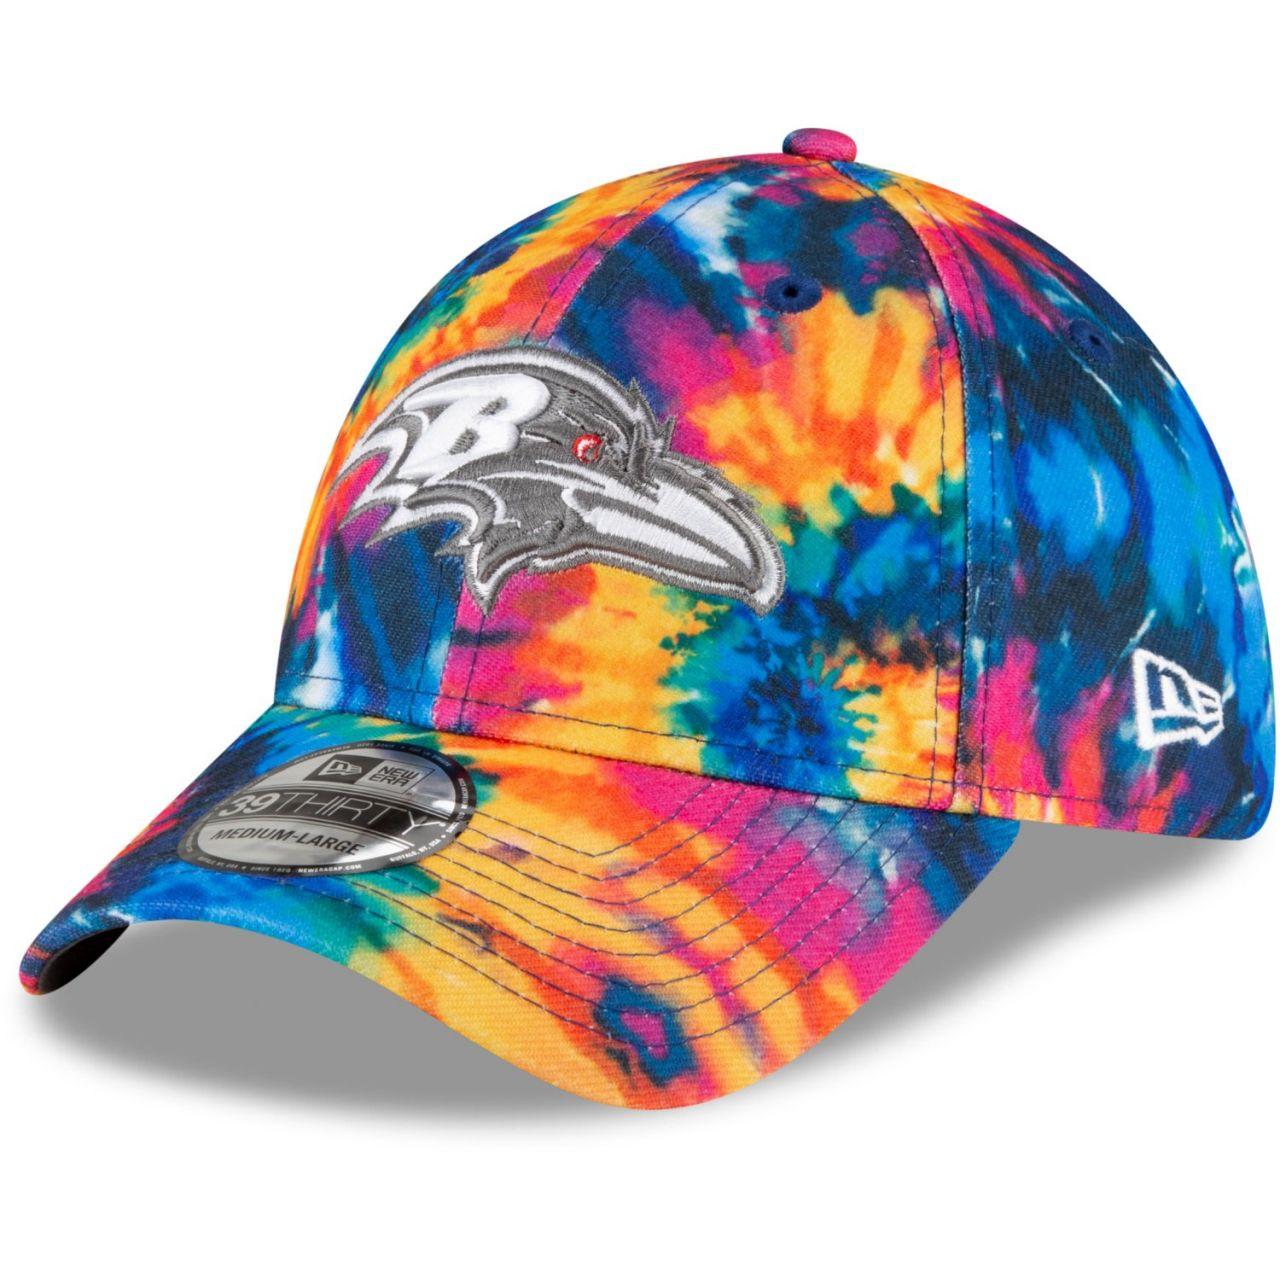 amfoo - New Era 39Thirty Cap - CRUCIAL CATCH Baltimore Ravens